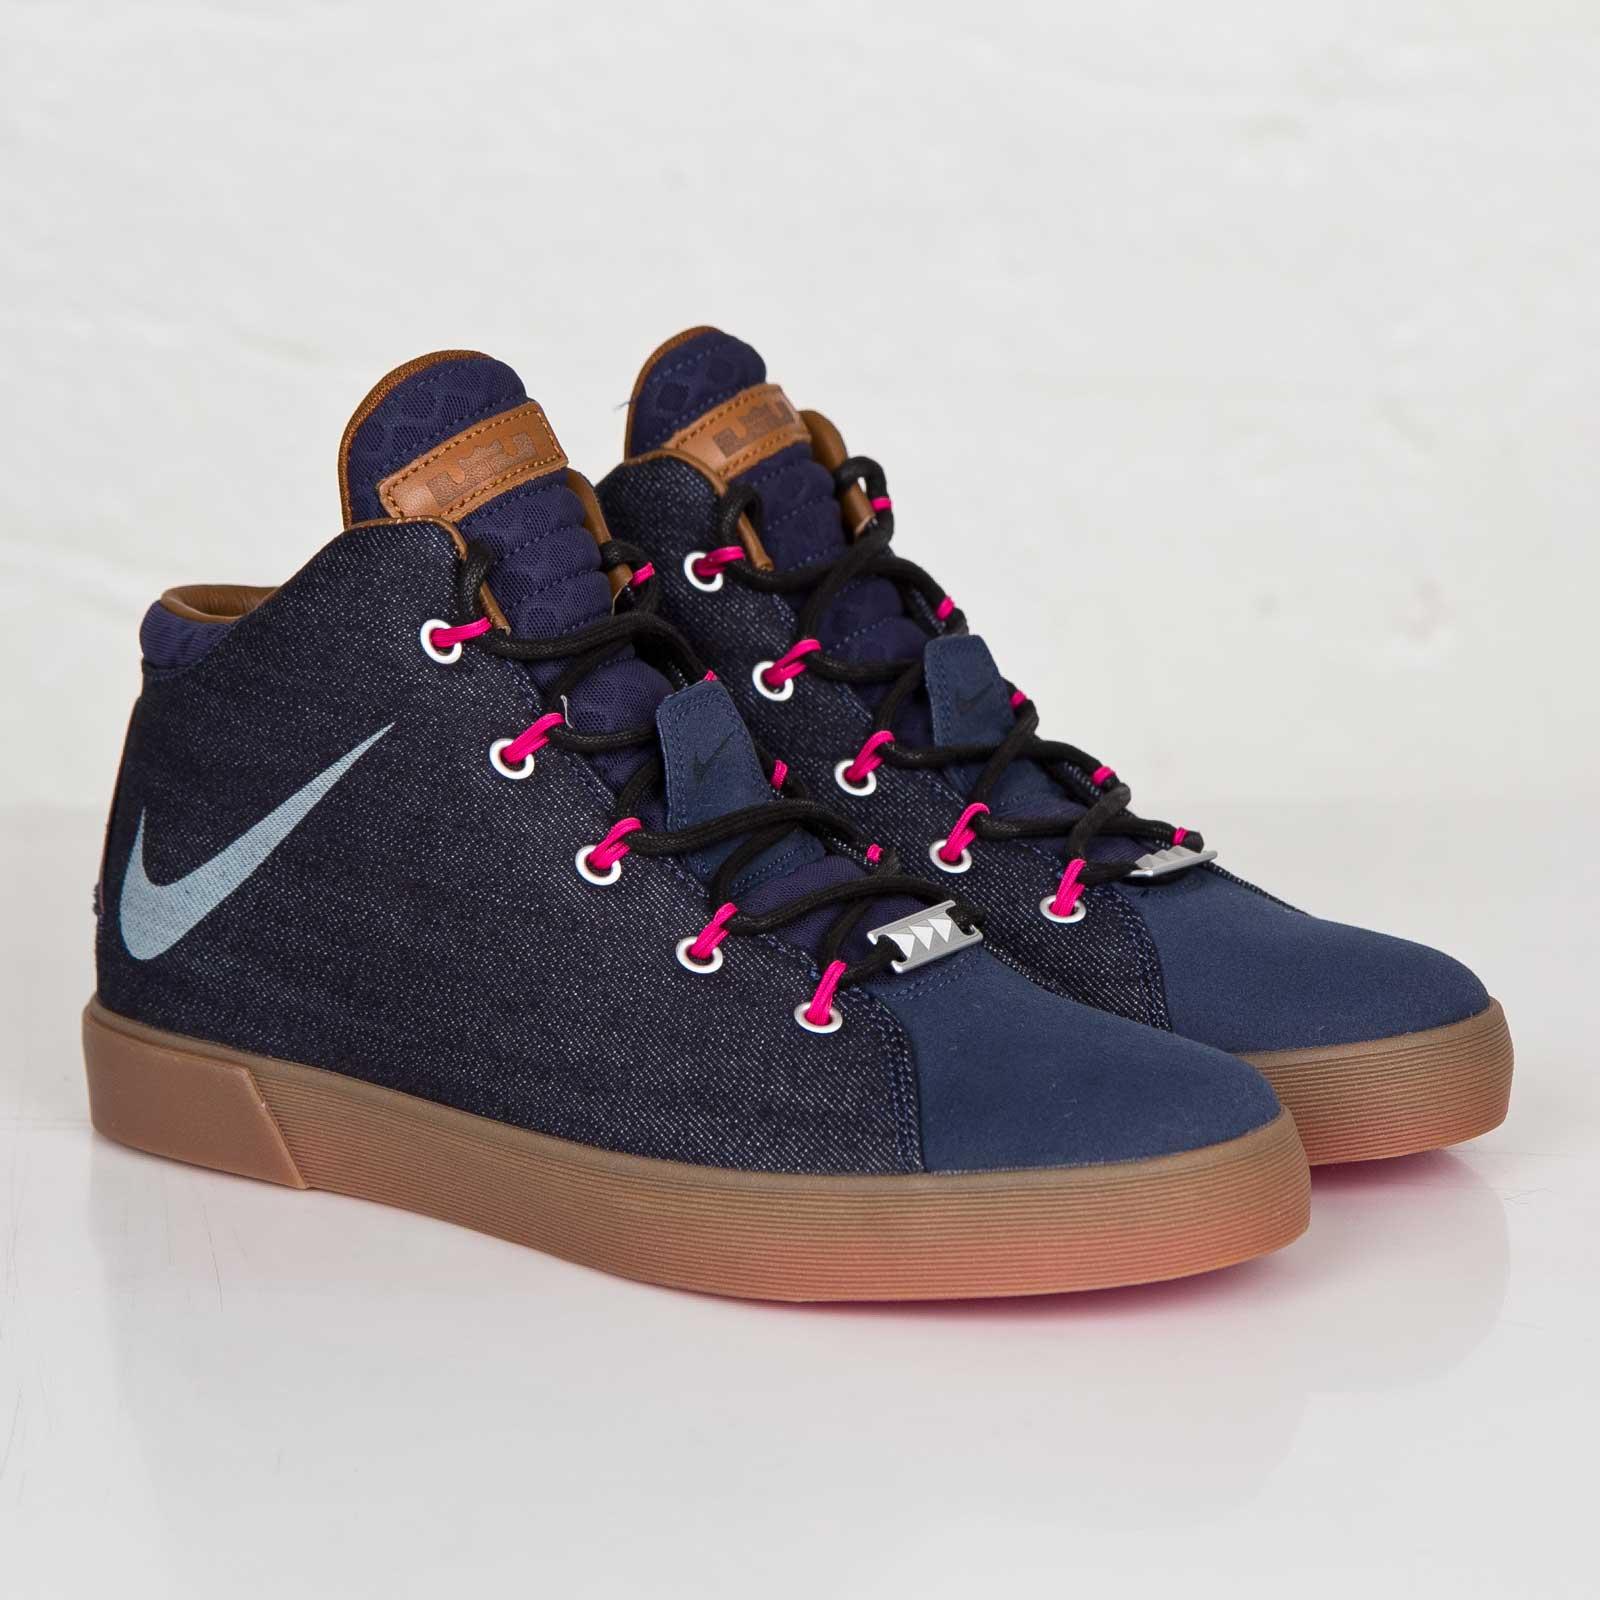 953810427c Nike Lebron XII NSW Denim LFSTYL QS - 716424-400 - Sneakersnstuff ...